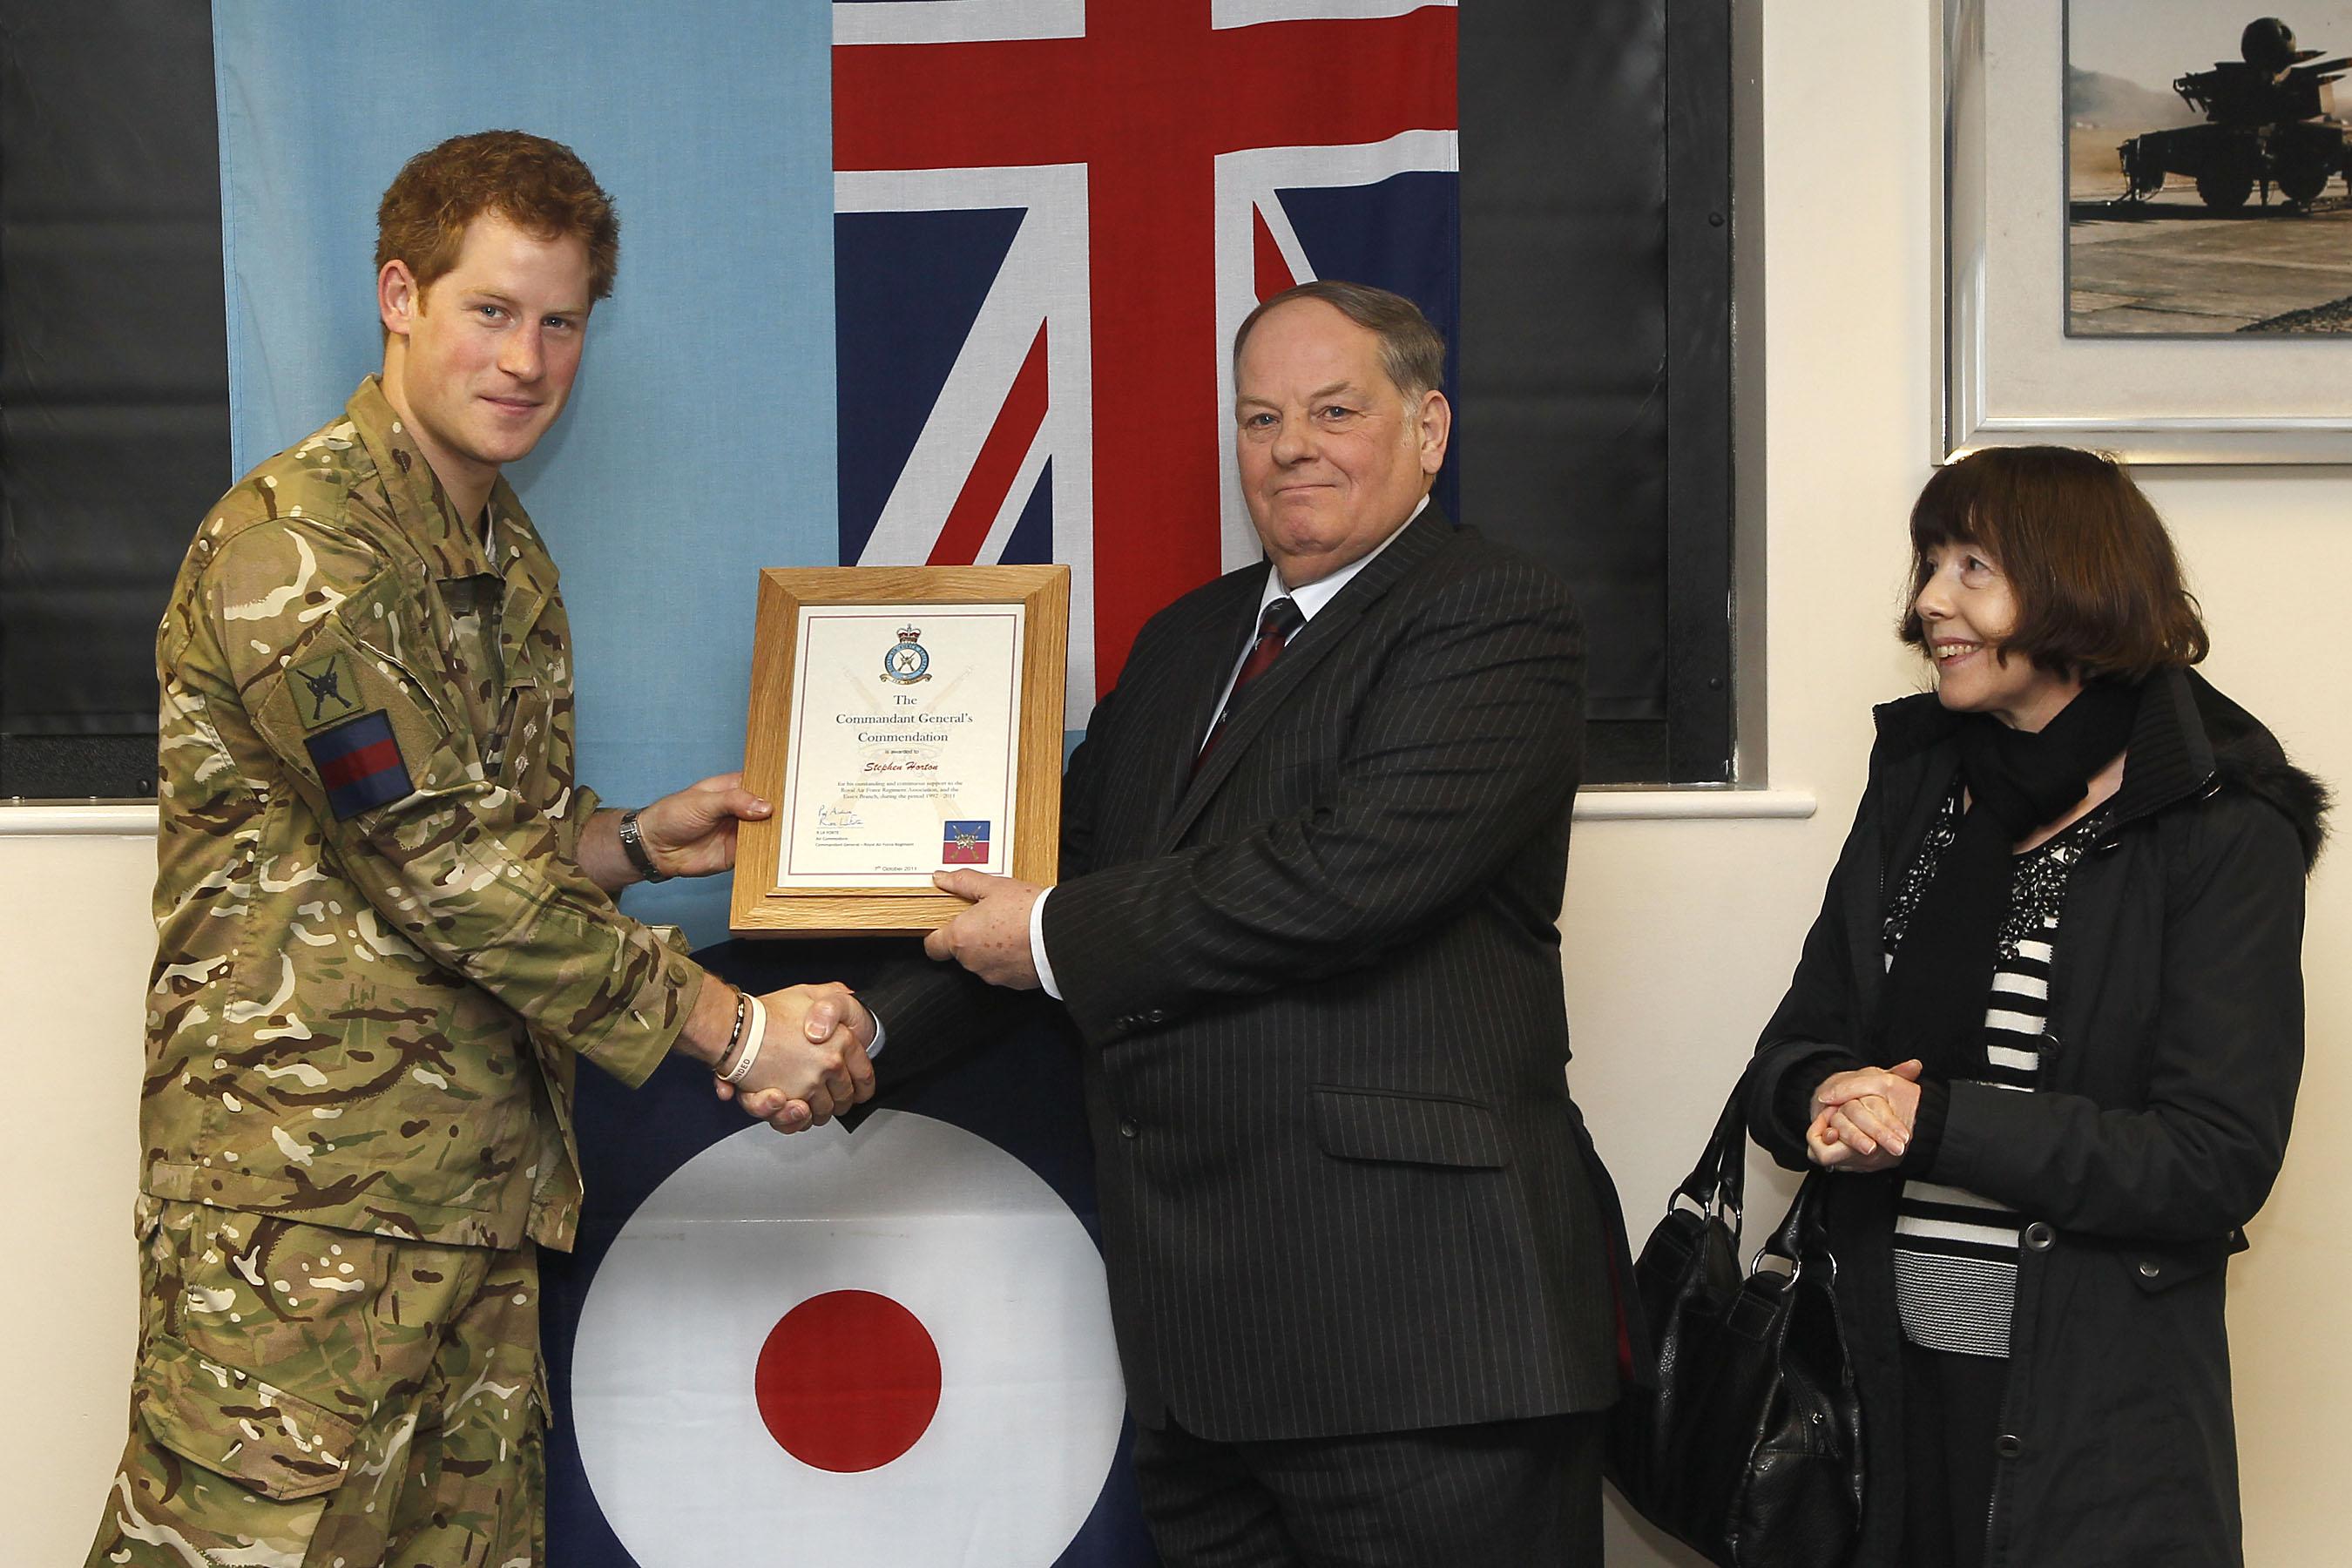 PRINCE HARRY VISITS RAF HONINGTON